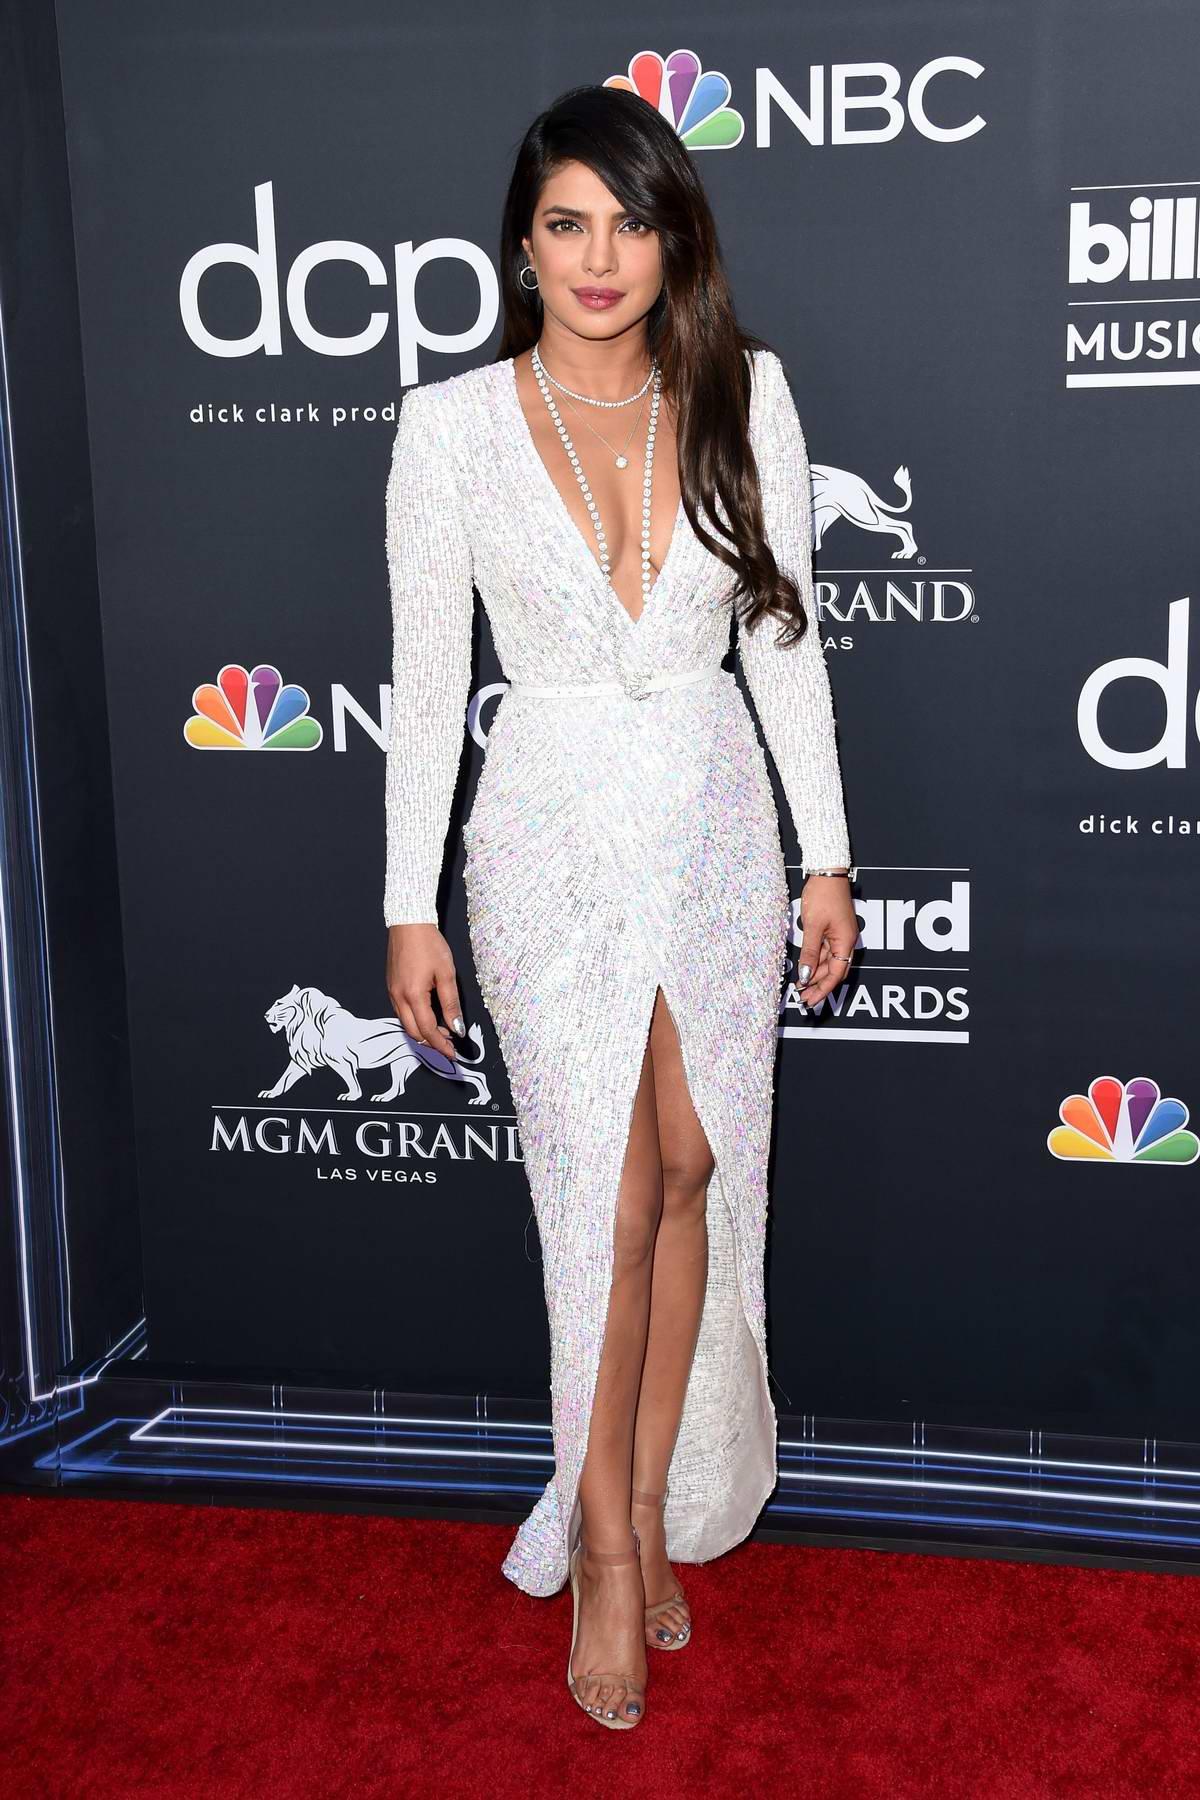 Priyanka Chopra attends the 2019 Billboard Music Awards at MGM Grand Garden Arena in Las Vegas, Nevada